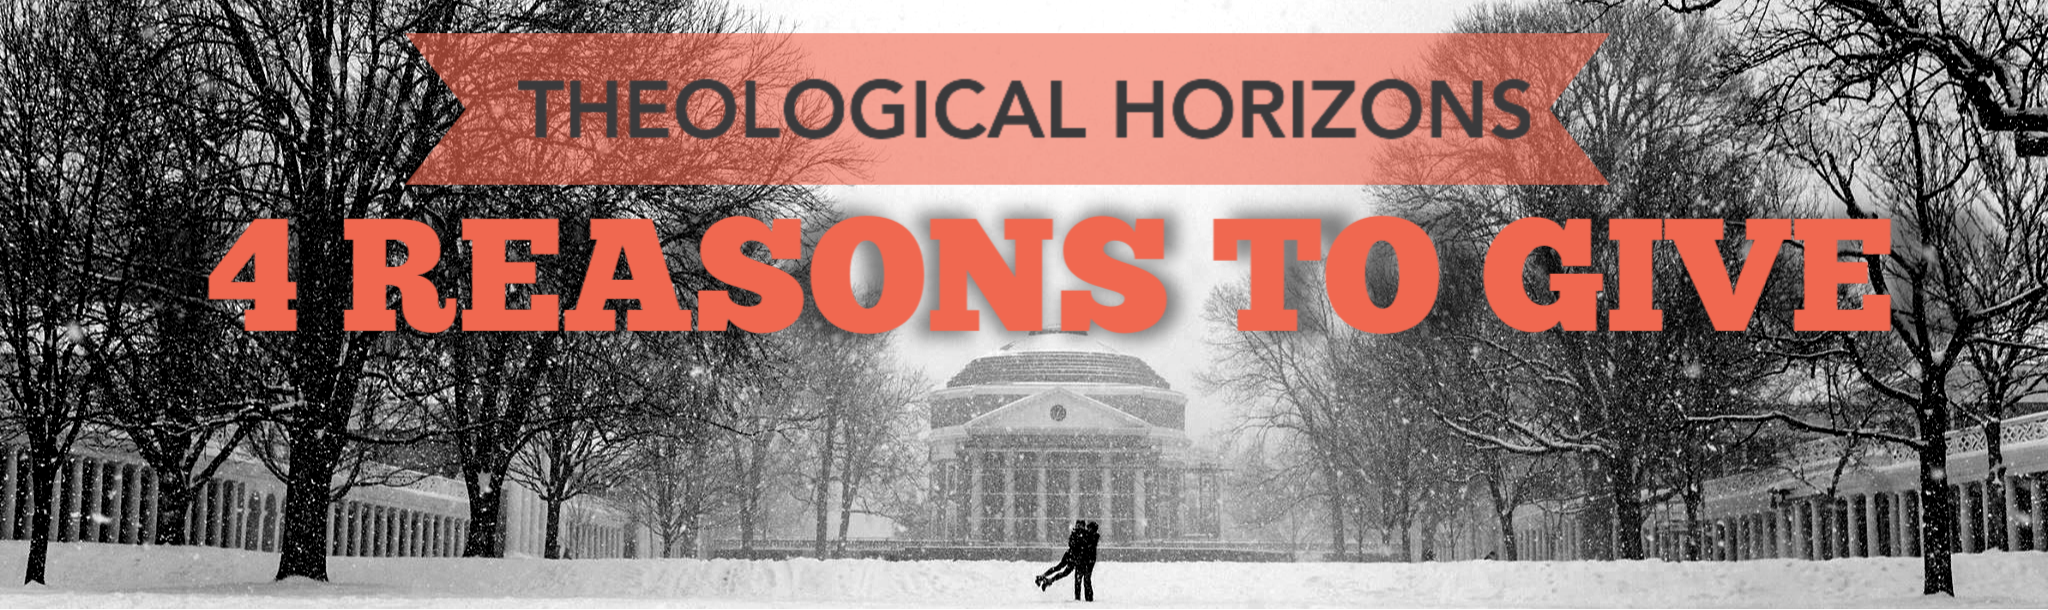 https://www.theologicalhorizons.org/giving